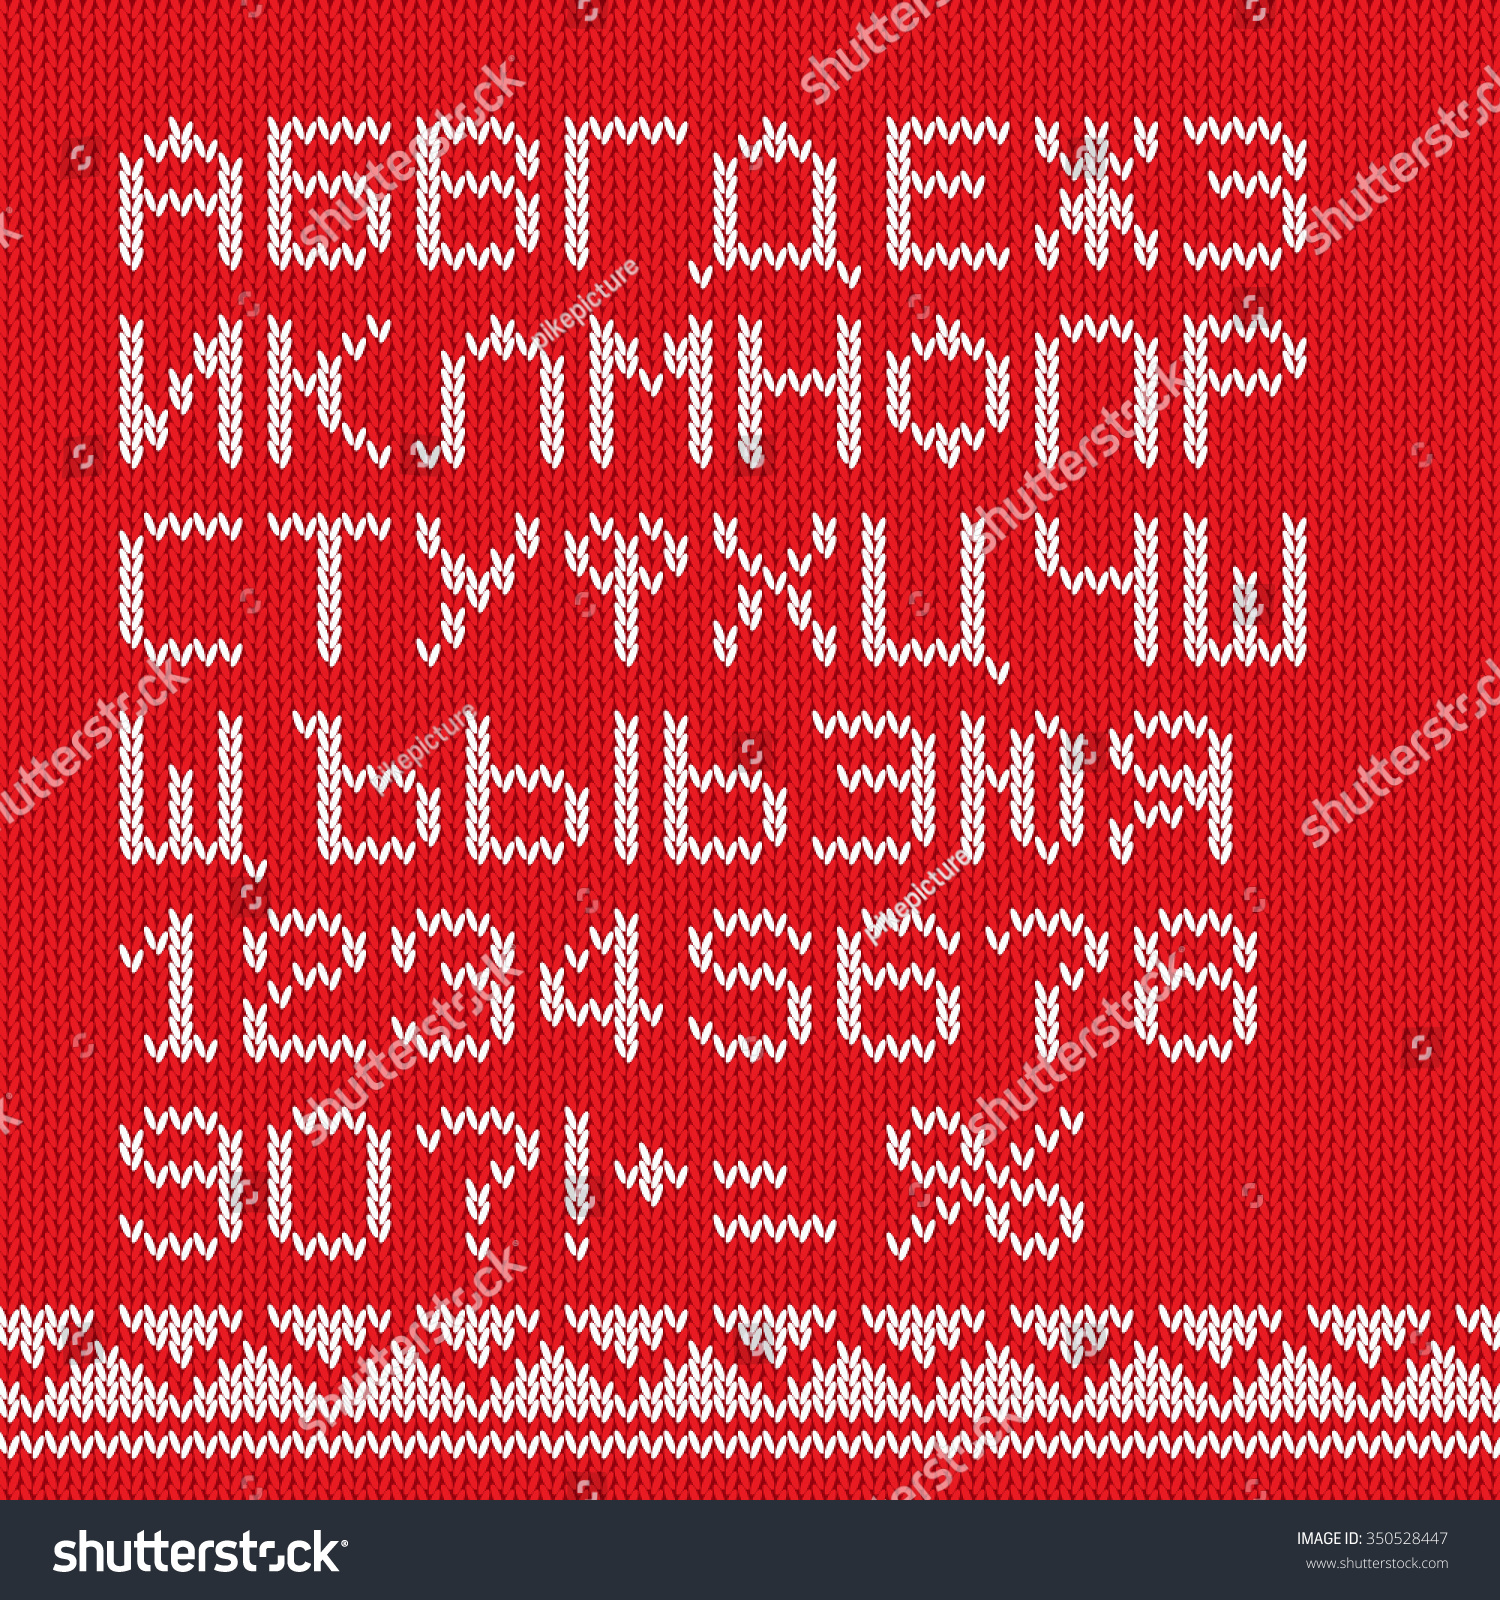 Christmas Knitting Font Design Russian Alphabet Stock Vector ...